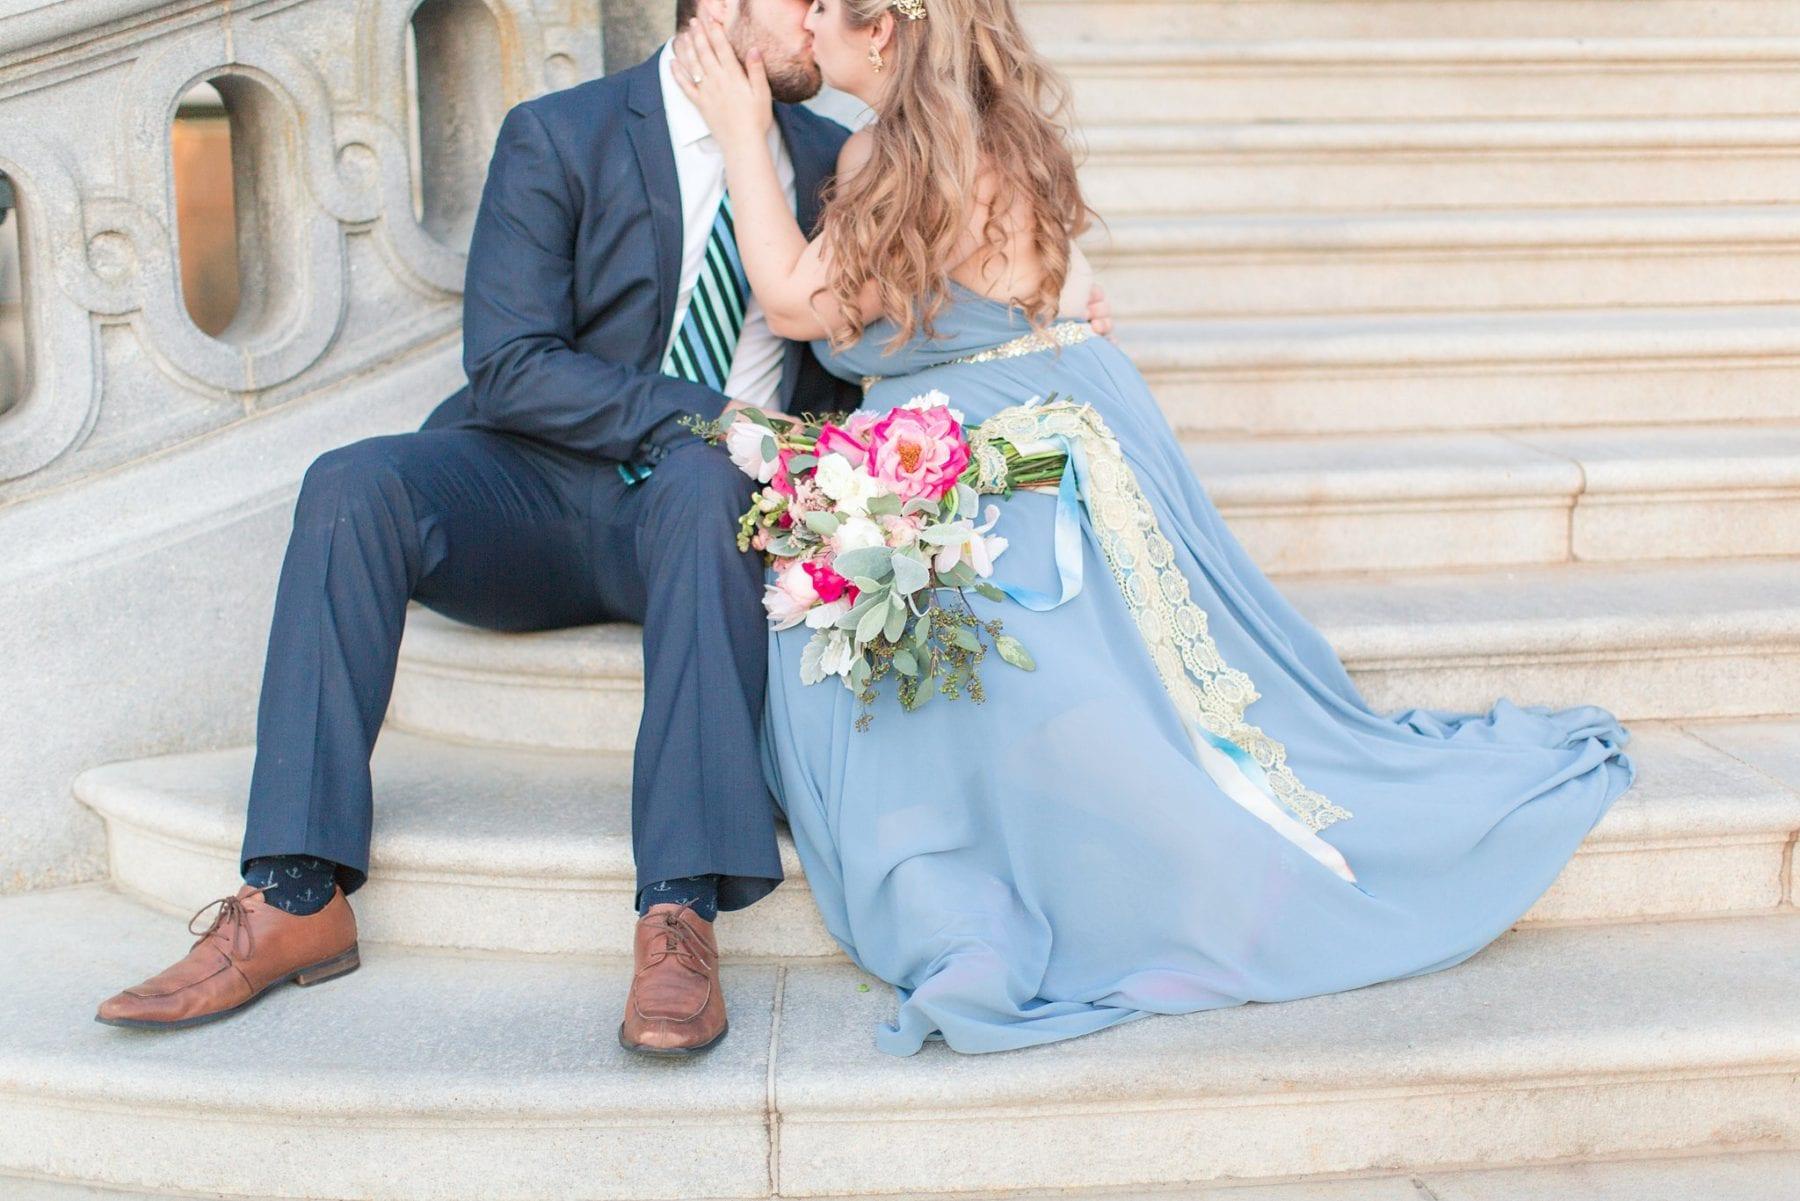 Capitol Hill Engagement Photos Kelly & Zach Washington DC Wedding Photographer Megan Kelsey Photography-348.jpg